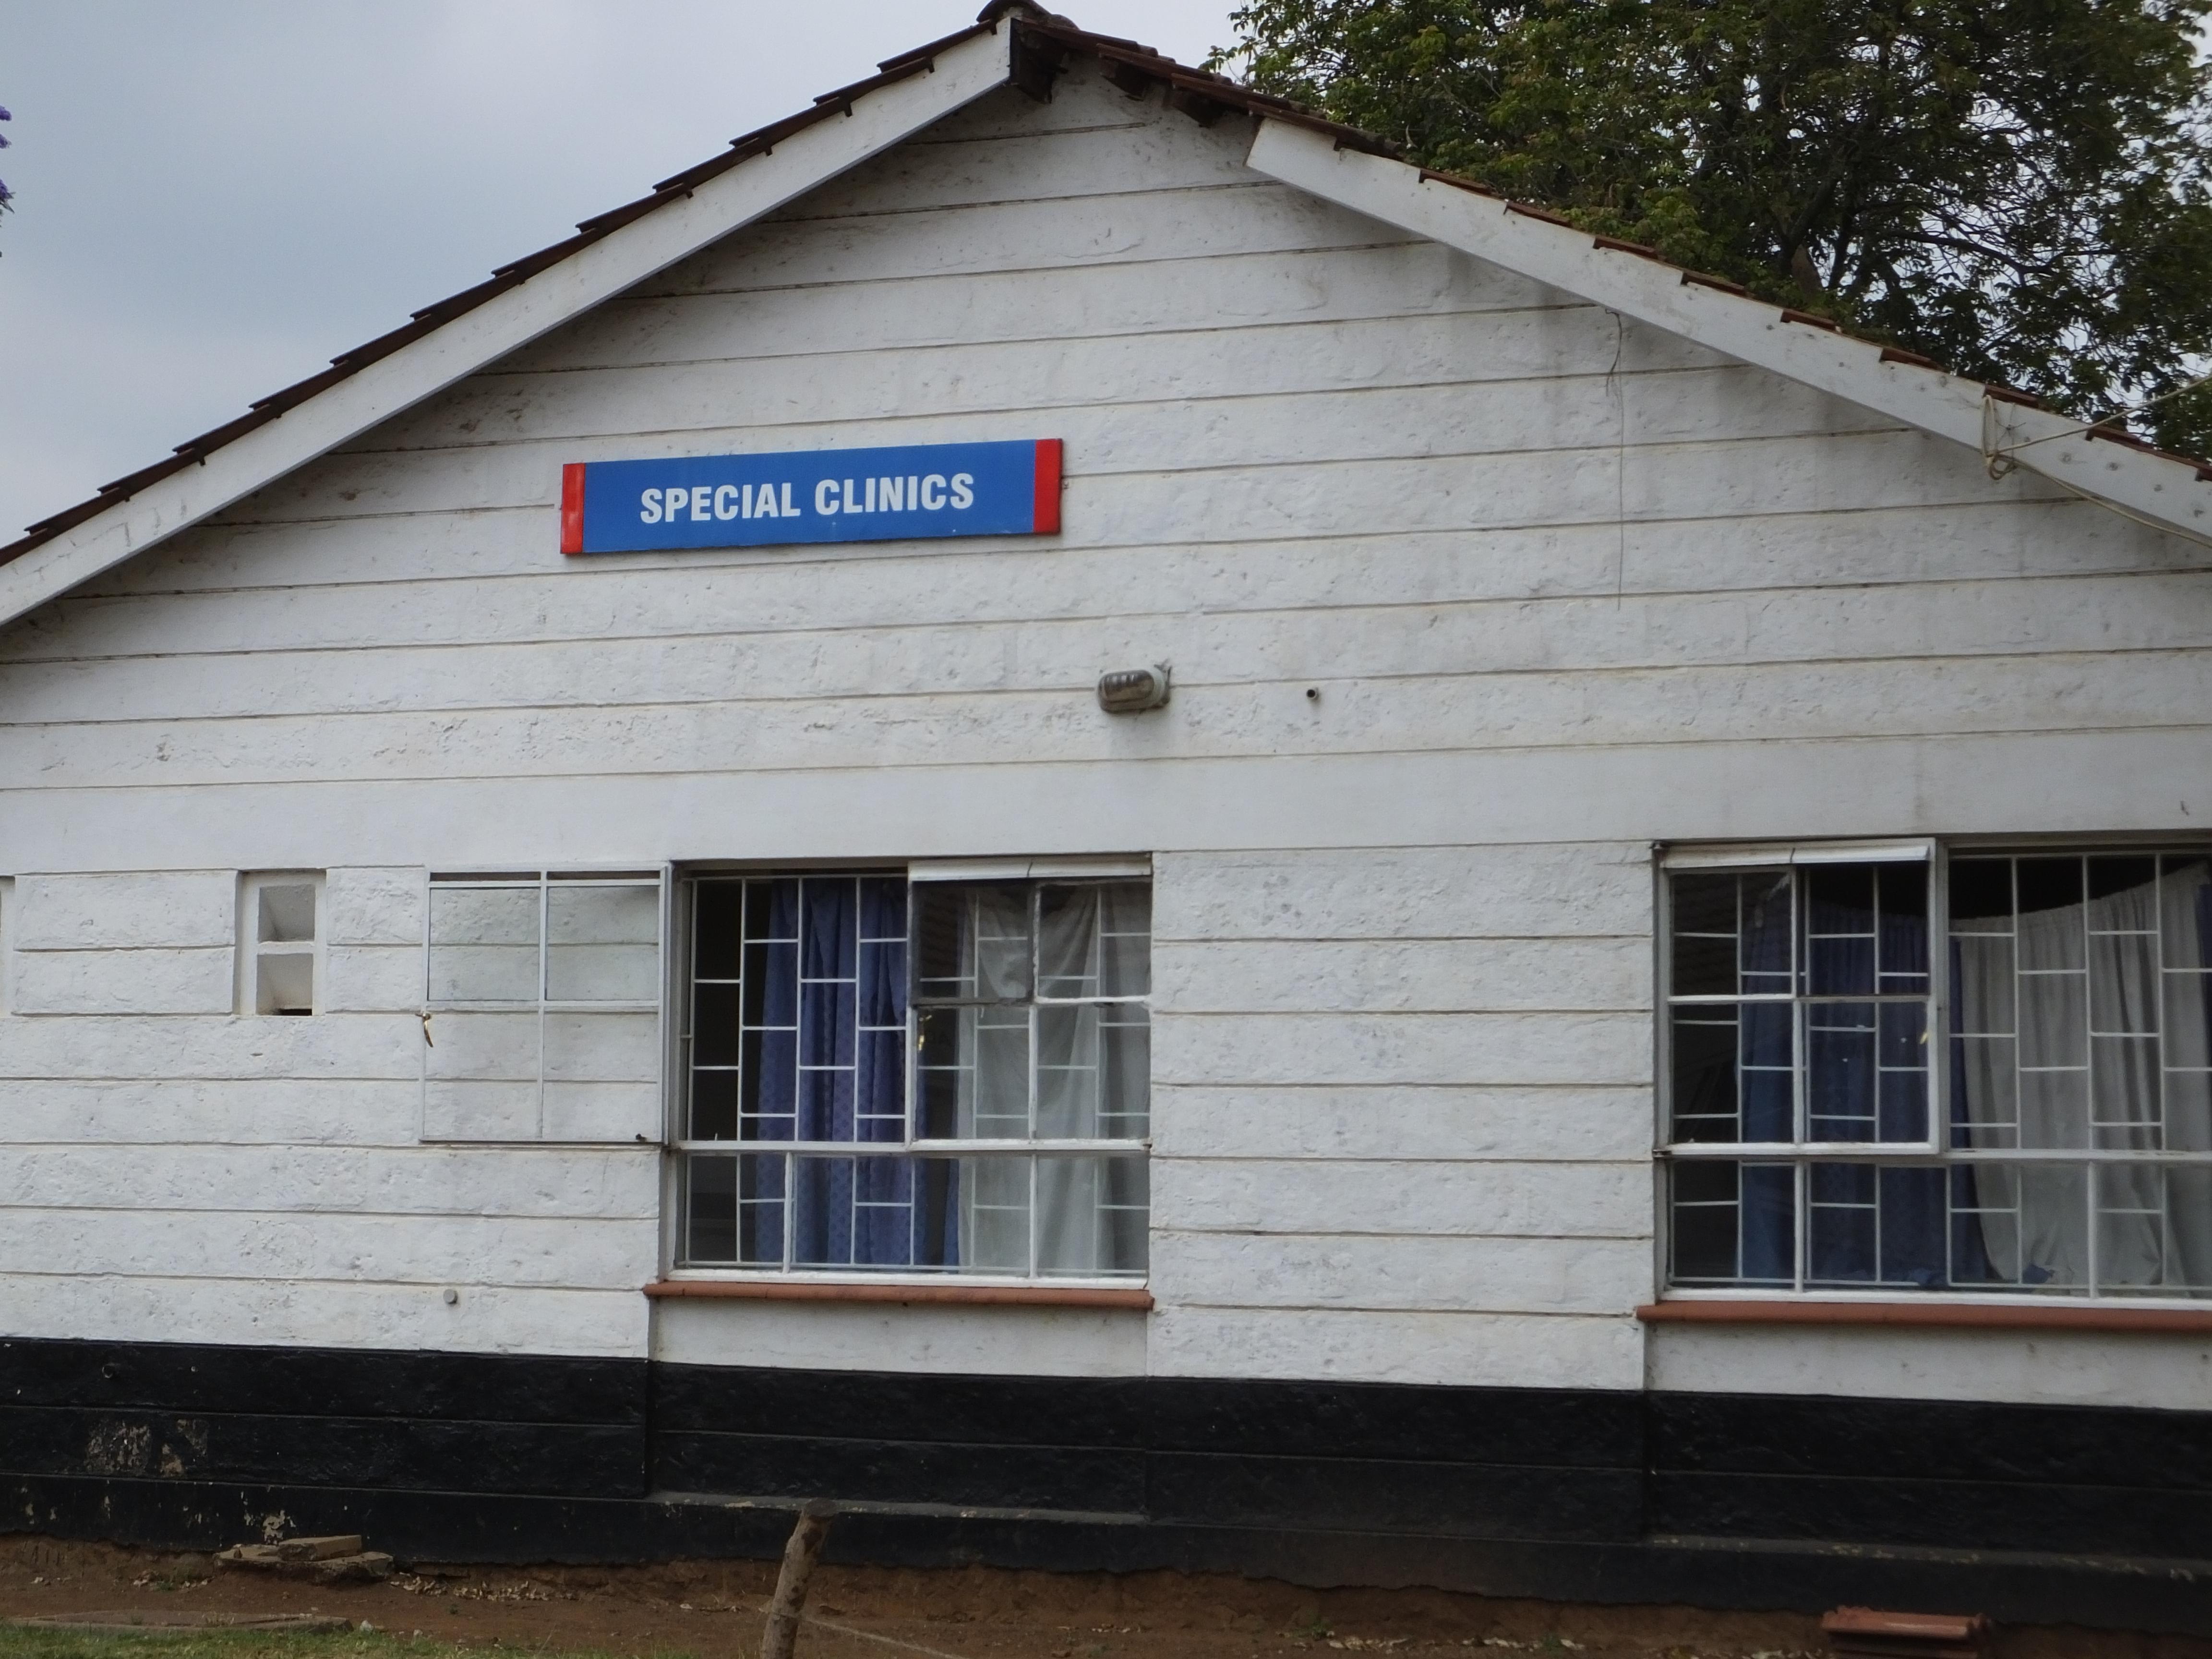 Public health clinic